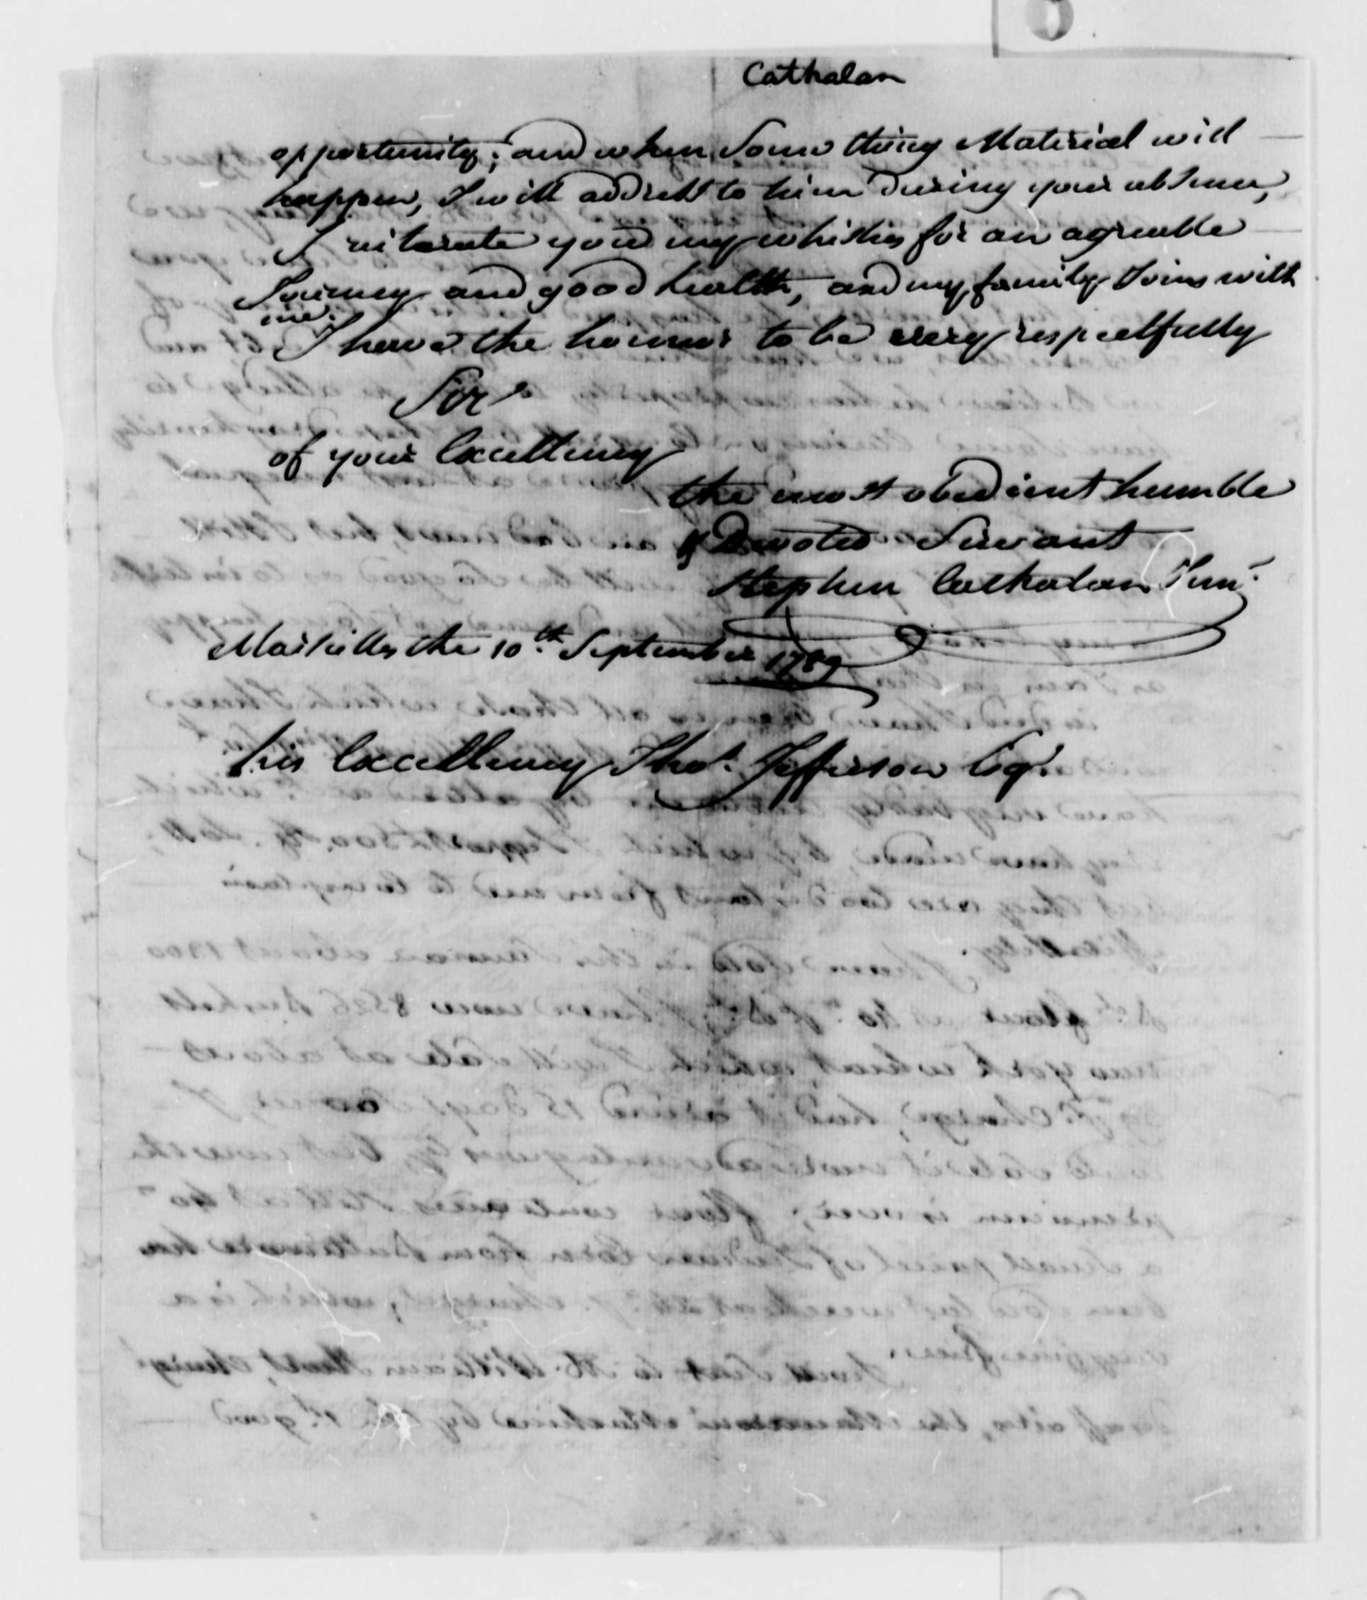 Stephen Cathalan, Jr. to Thomas Jefferson, September 10, 1789